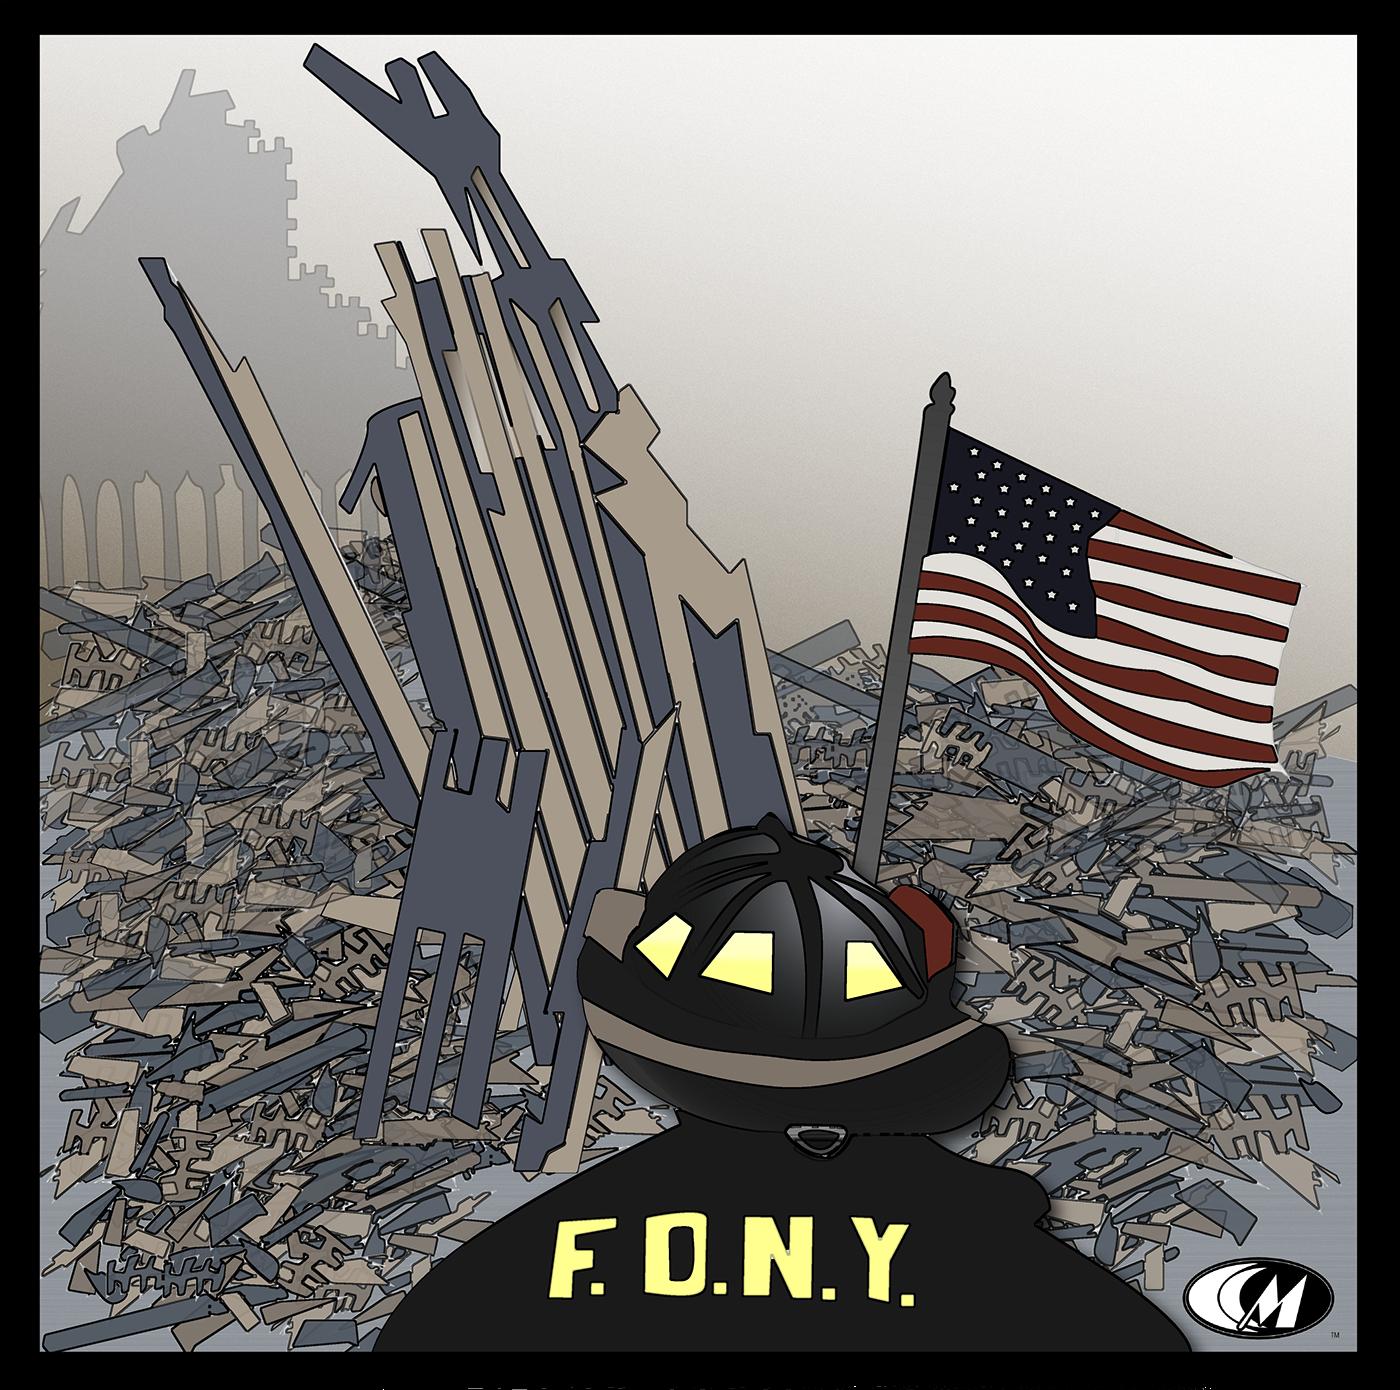 September 11 ground zero Patriot's Day american flag Firefighter nyc World Trade Center hope strength remember